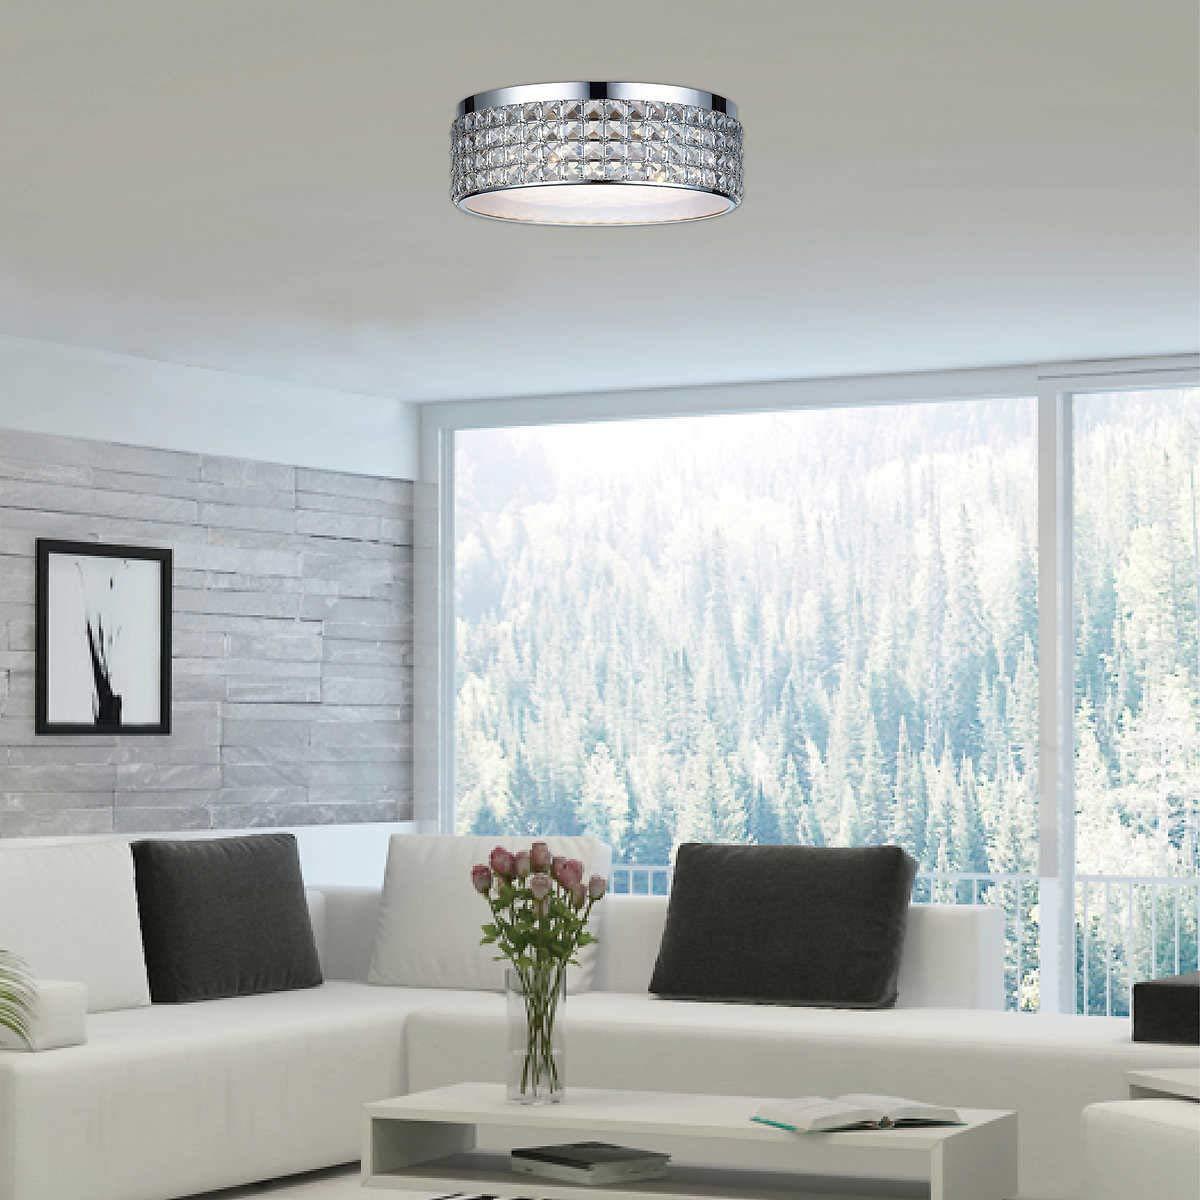 Dsi lighting callisto crystal ceiling led flush mount dimmable light fixture